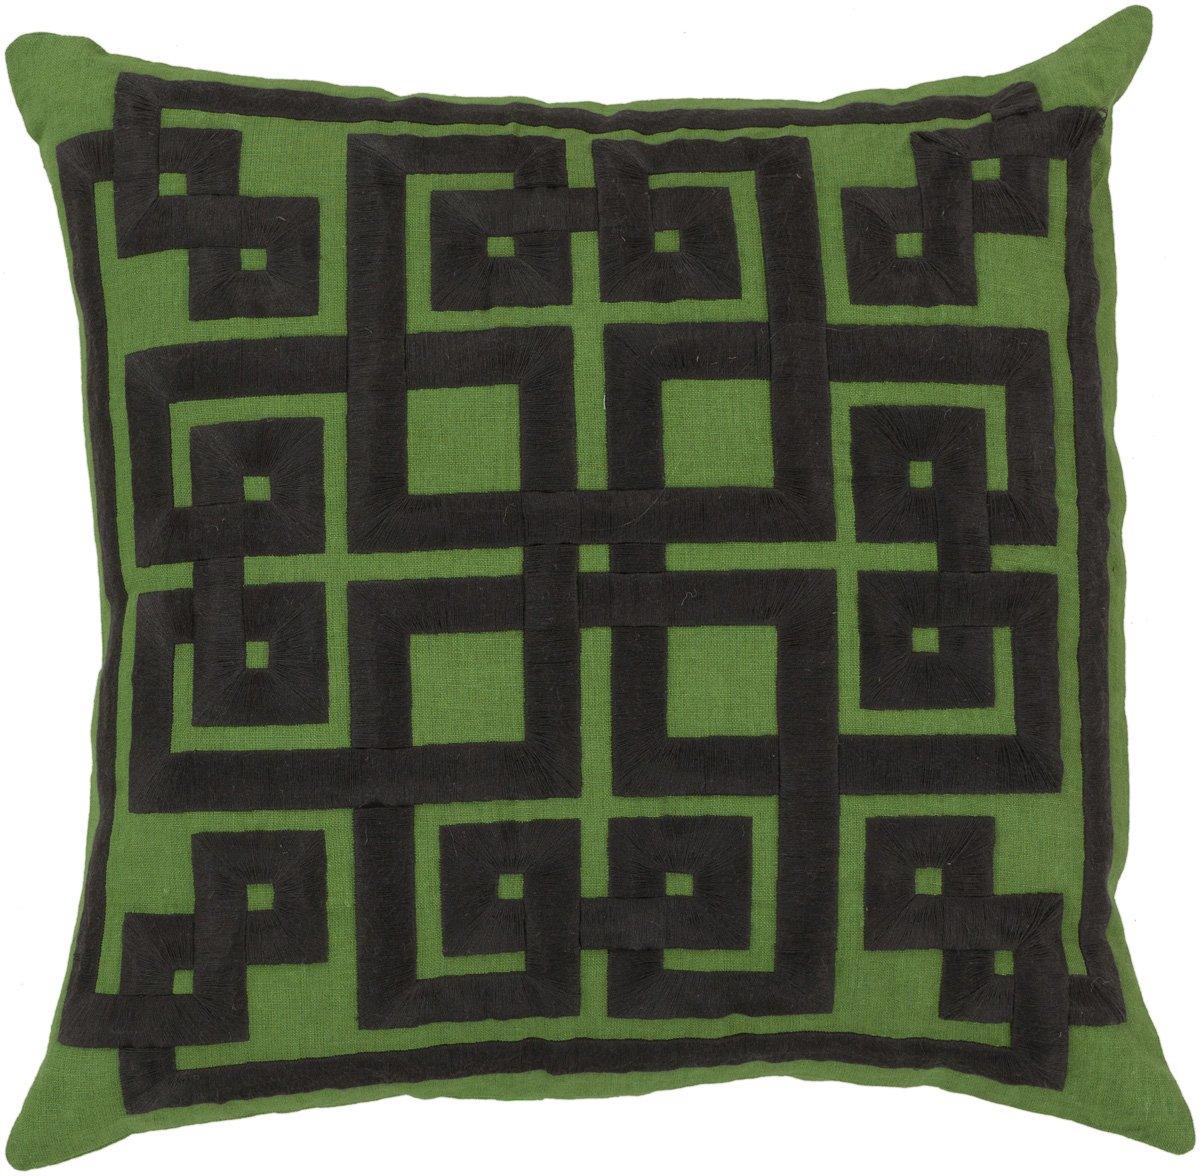 Surya ld012 – 2020d Down Fill枕、20インチby 20インチ、チャコール/ライム   B00H2KDY5Y